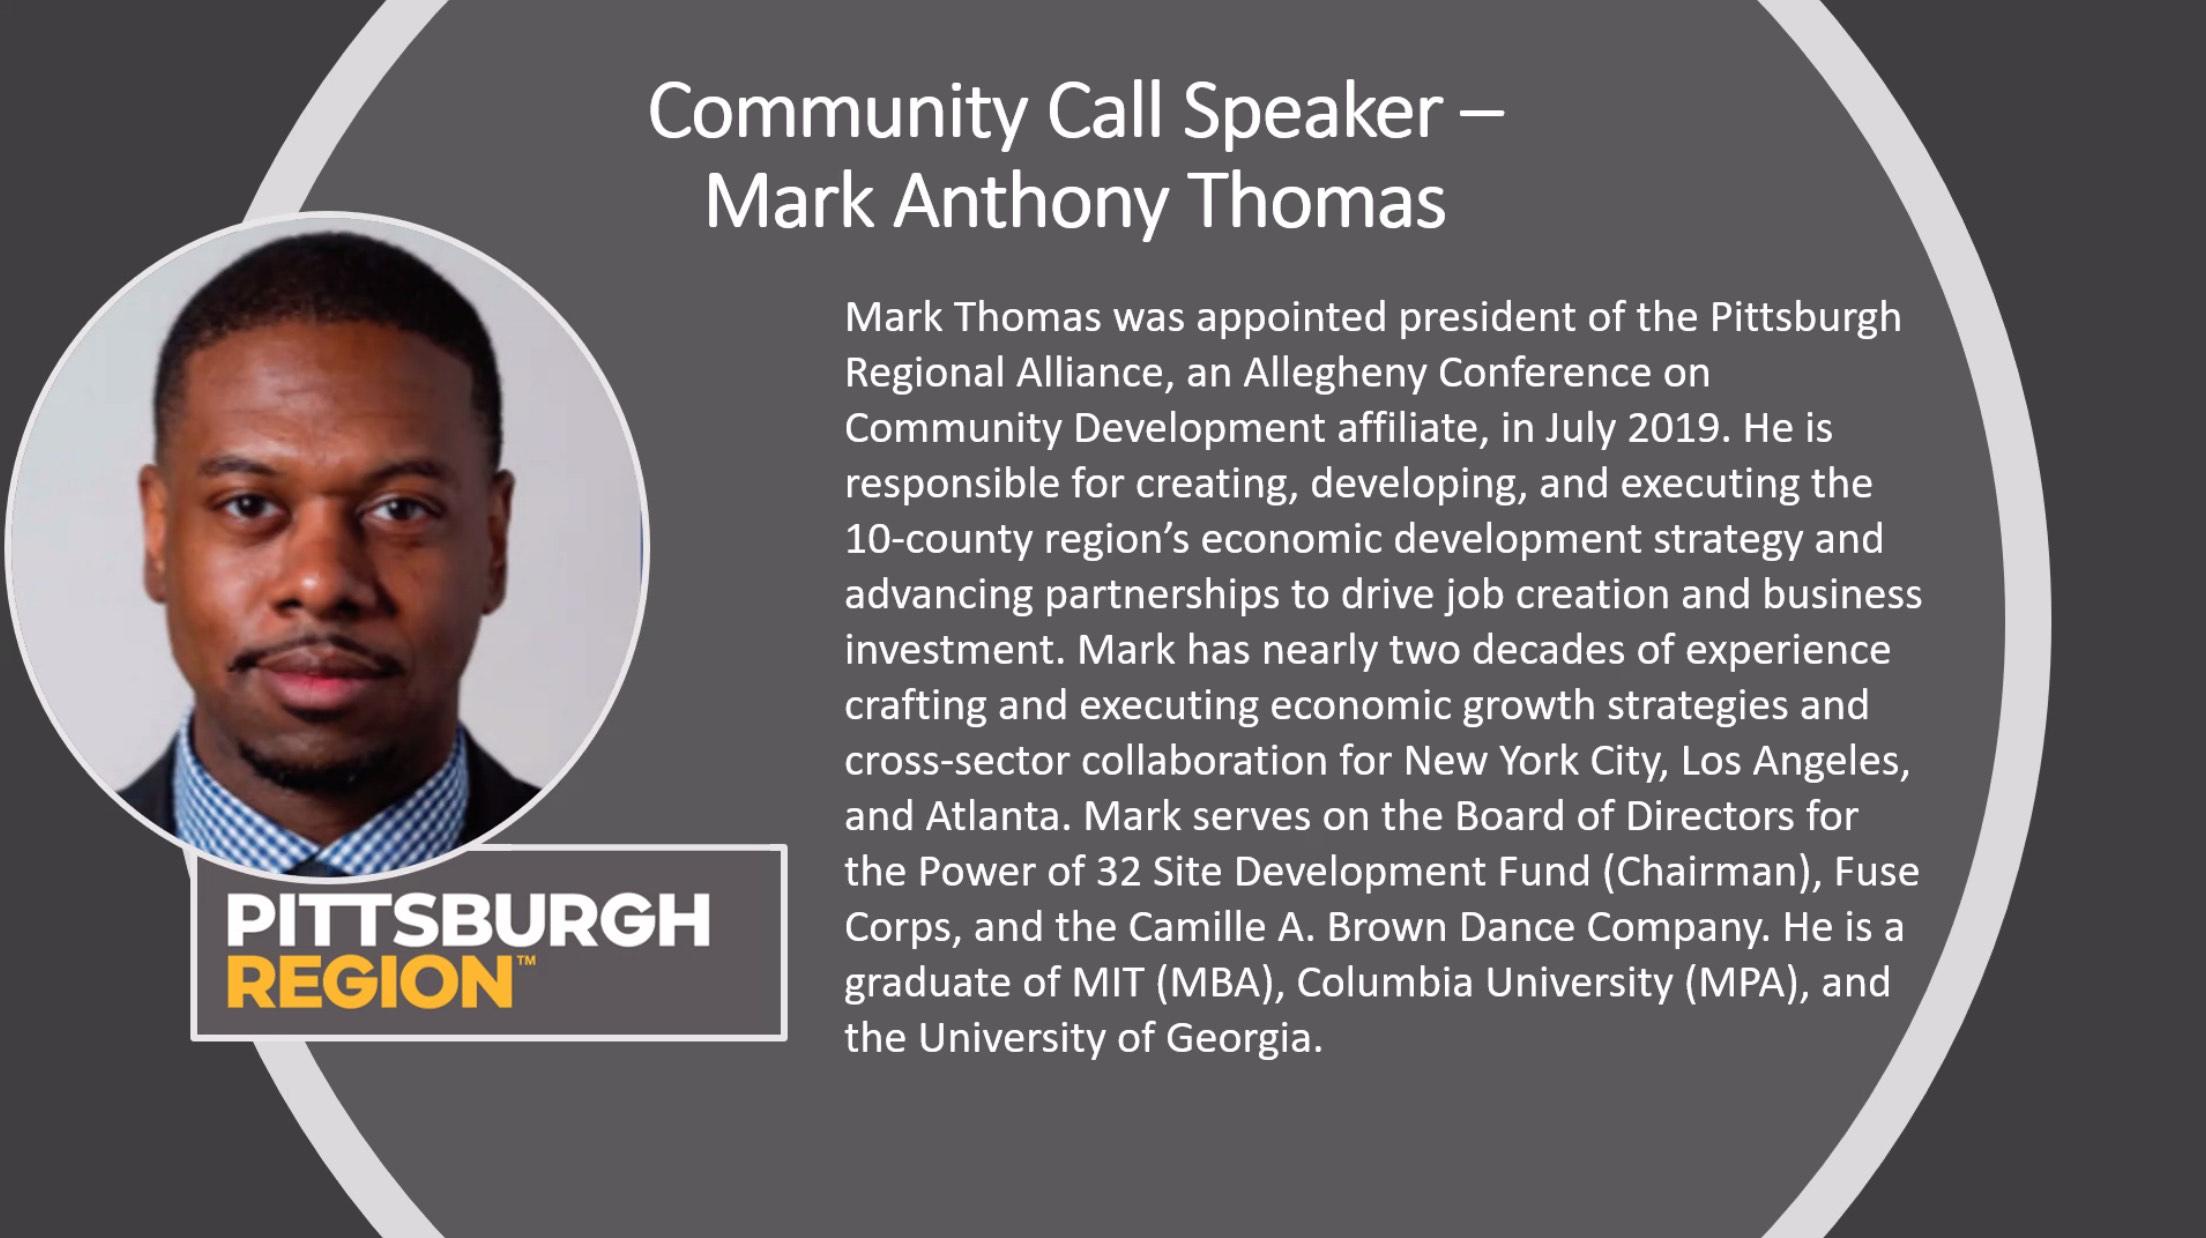 Professional Biography of Mark Anthony Thomas